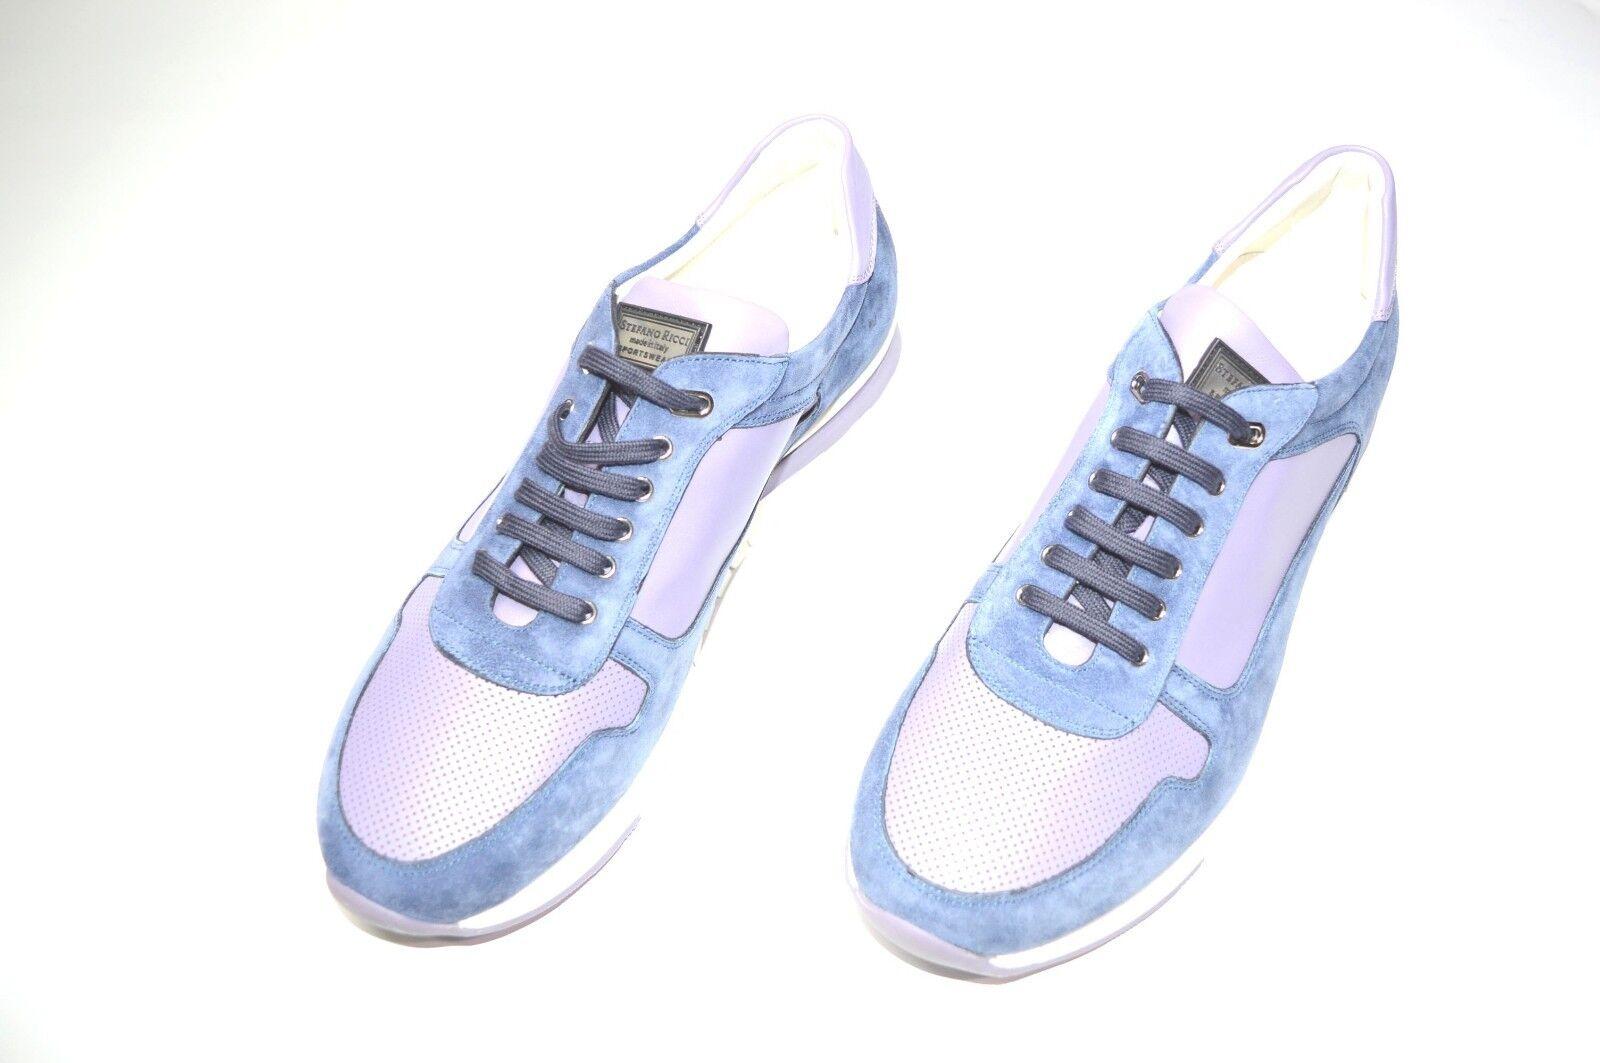 NEW STEFANO RICCI Pelle  Luxury Shoes Size Eu 40.5 Uk 6.5 Us 7.5 (Cod A212)